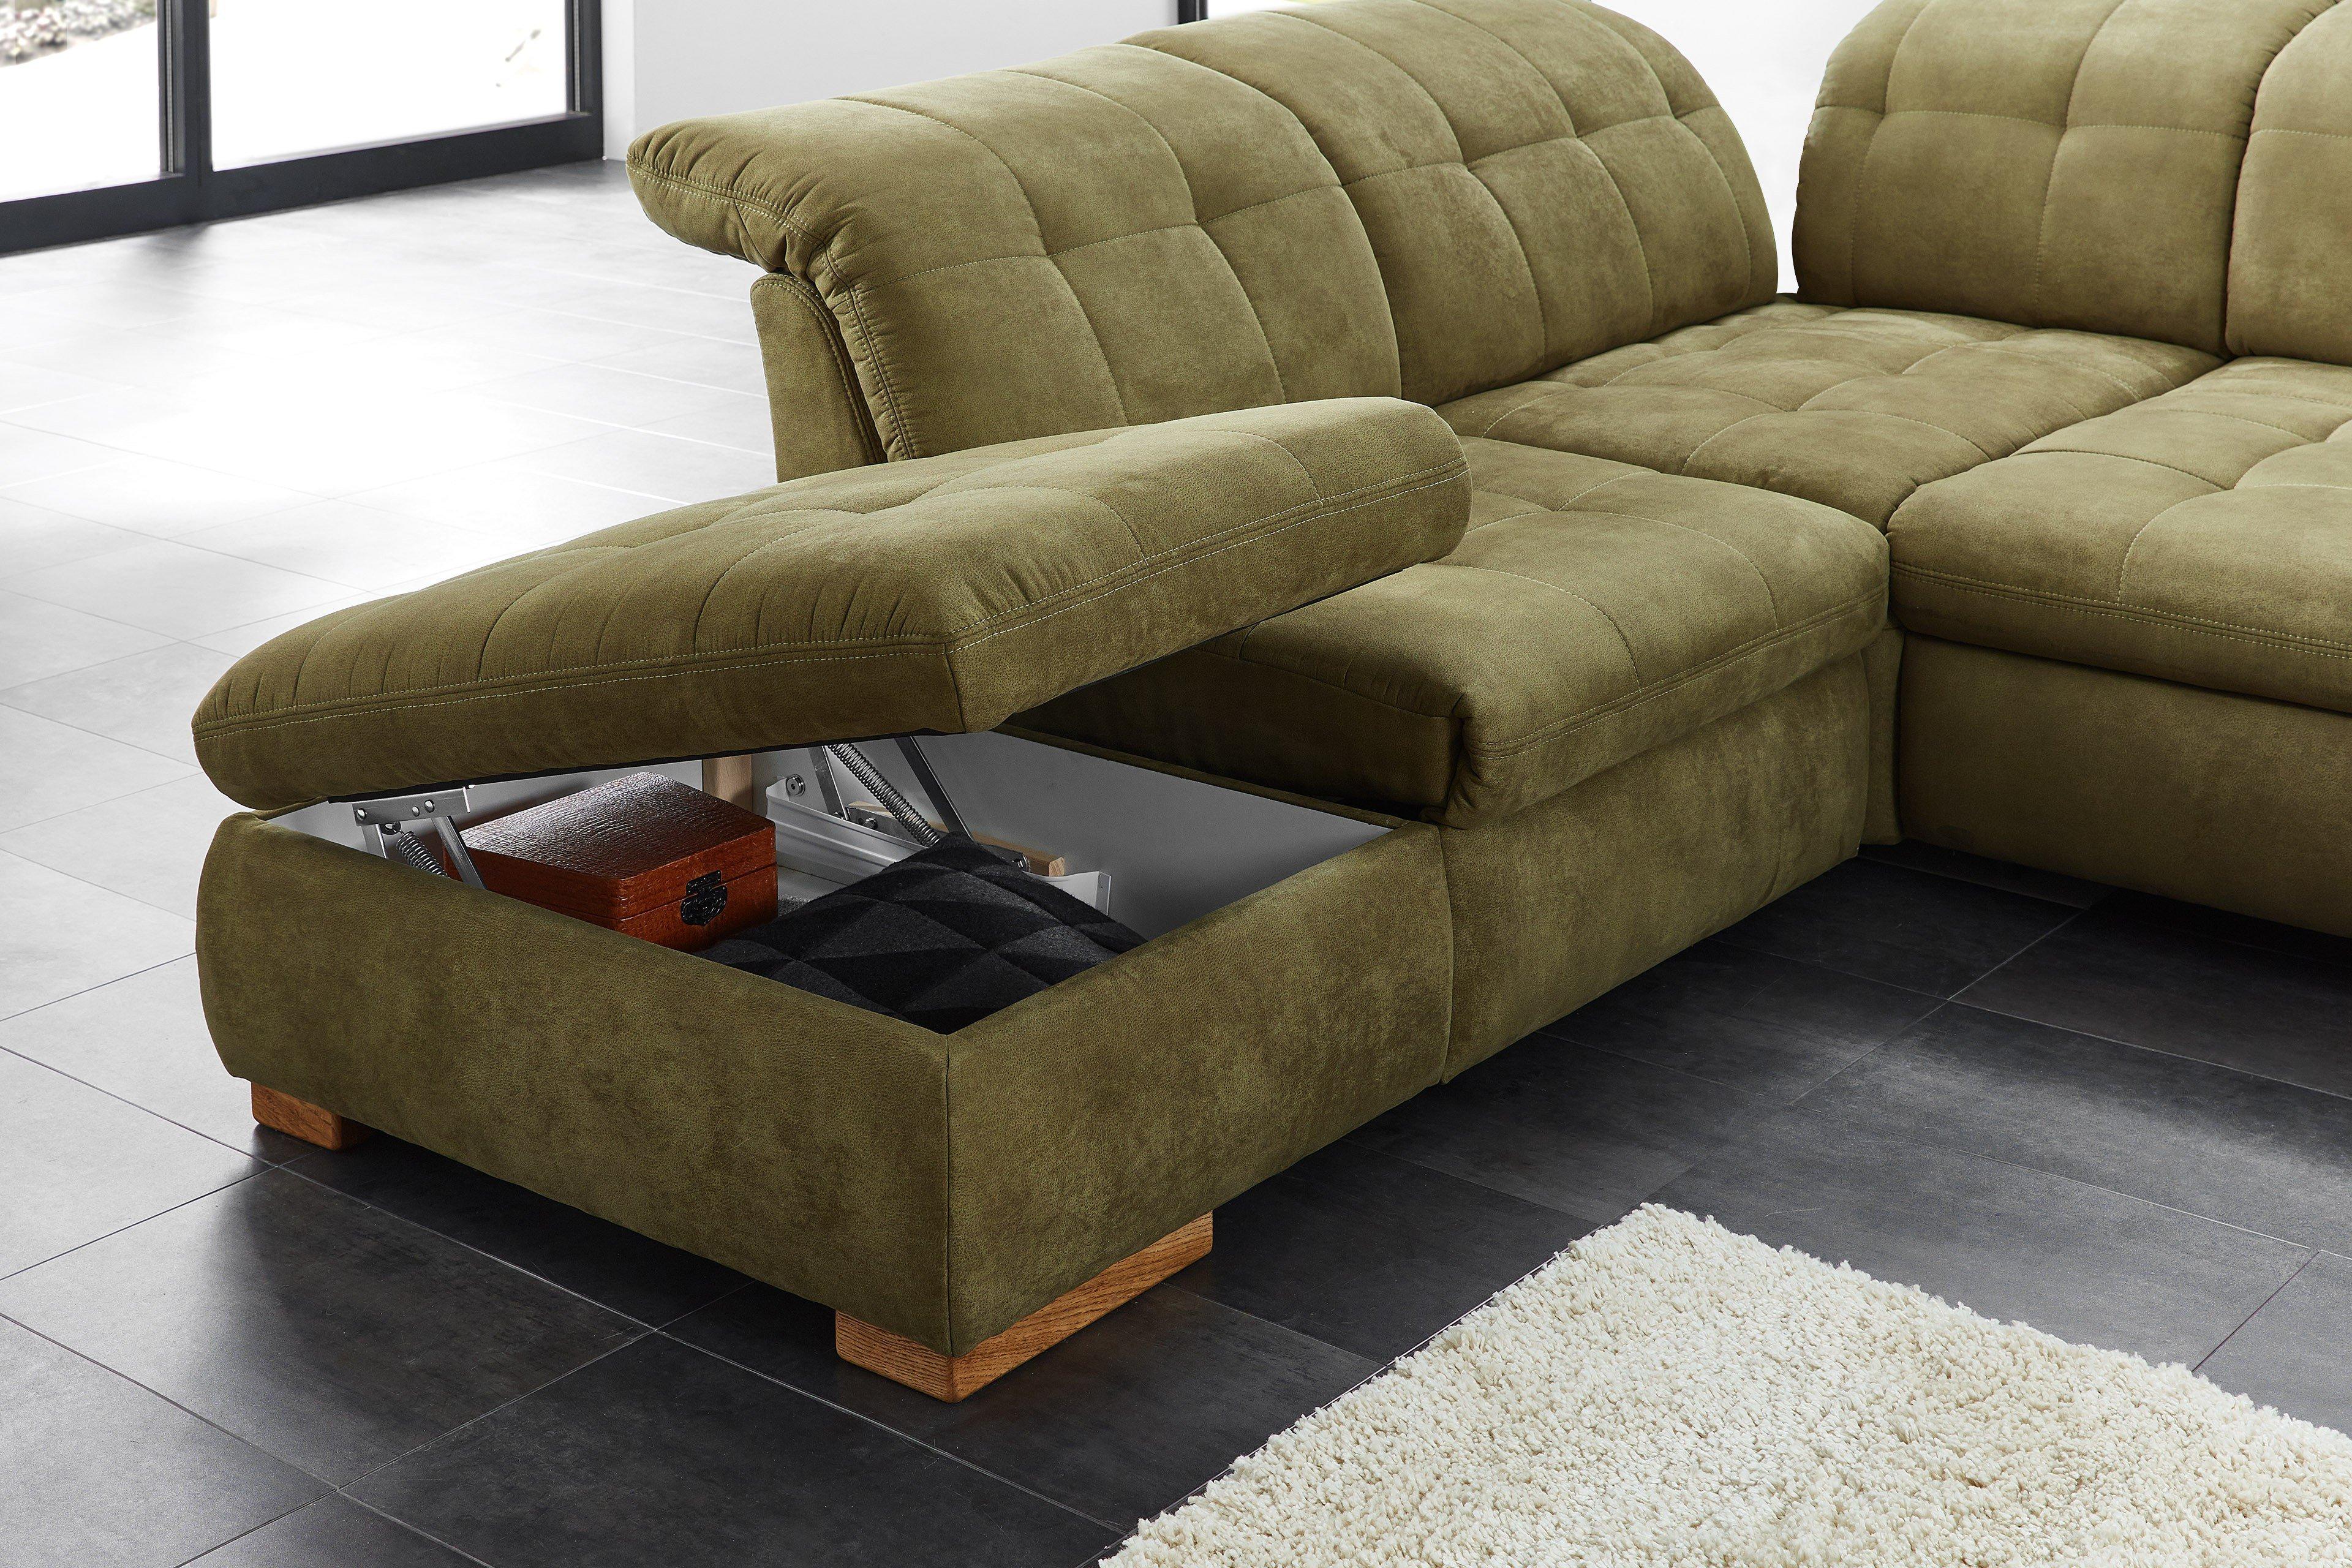 Poco polsterm bel houston sofa in u form gr n m bel letz for Wohnlandschaft poco